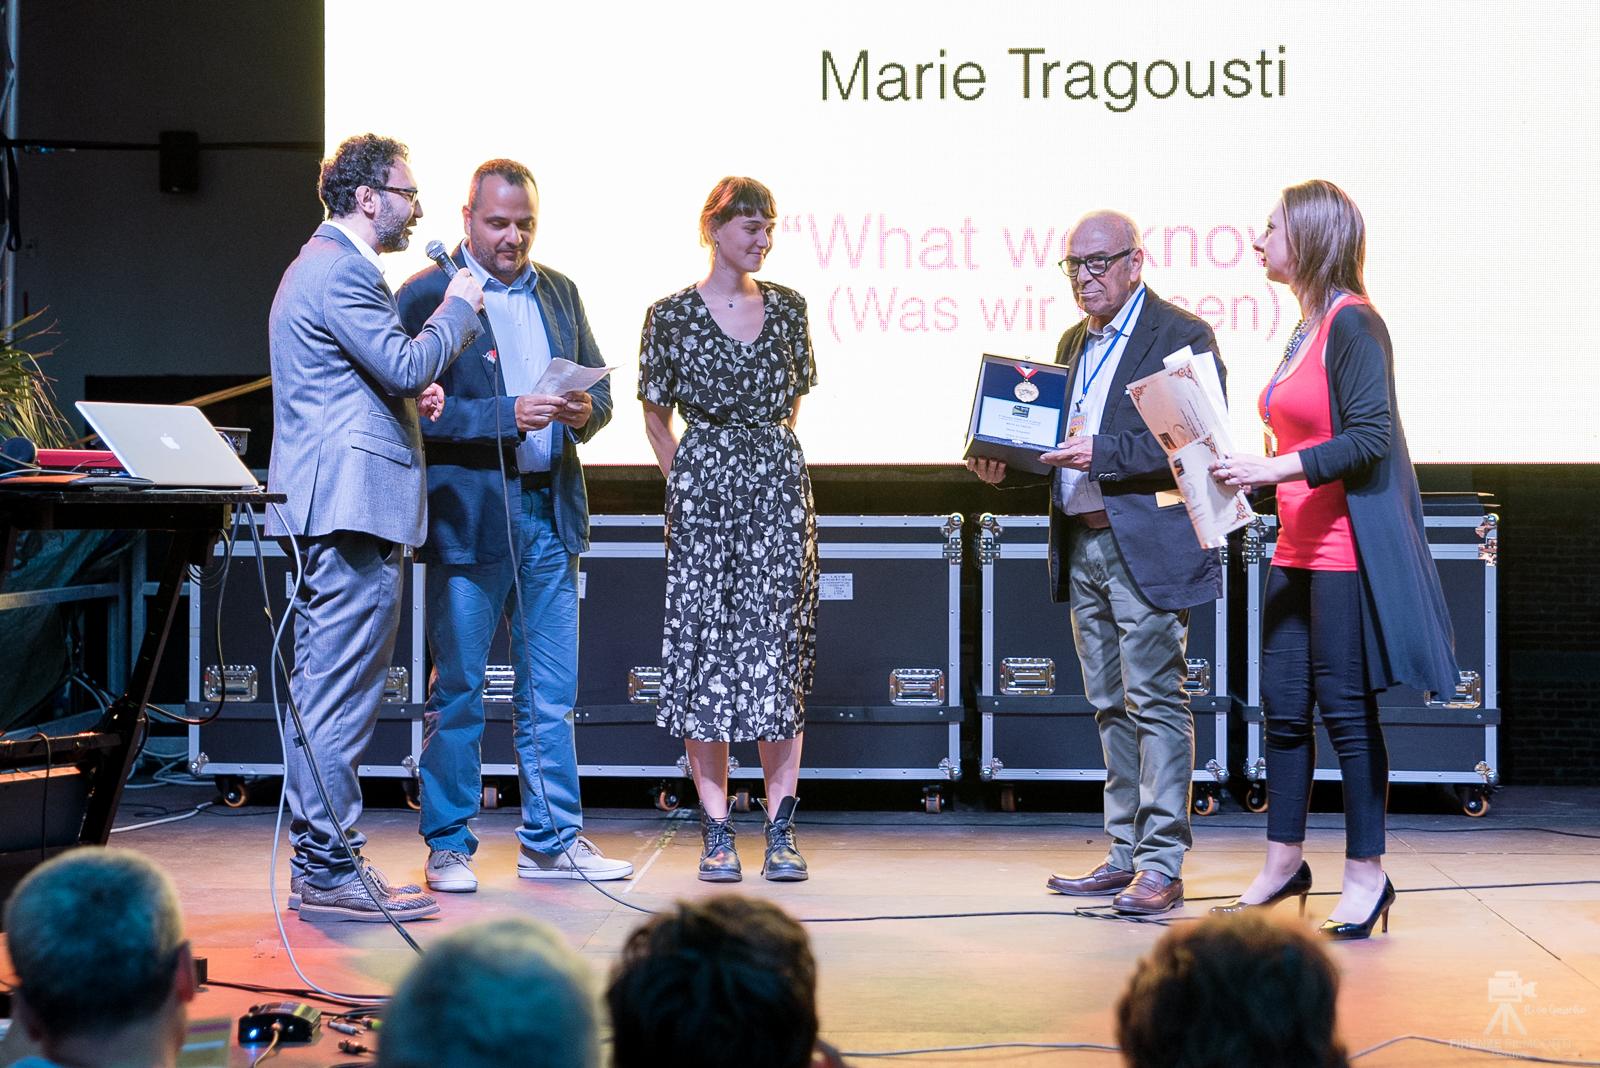 2018-06-16 - Rive Gauche - 2018 Firenze FilmCorti Festival-logofestival-115.jpg